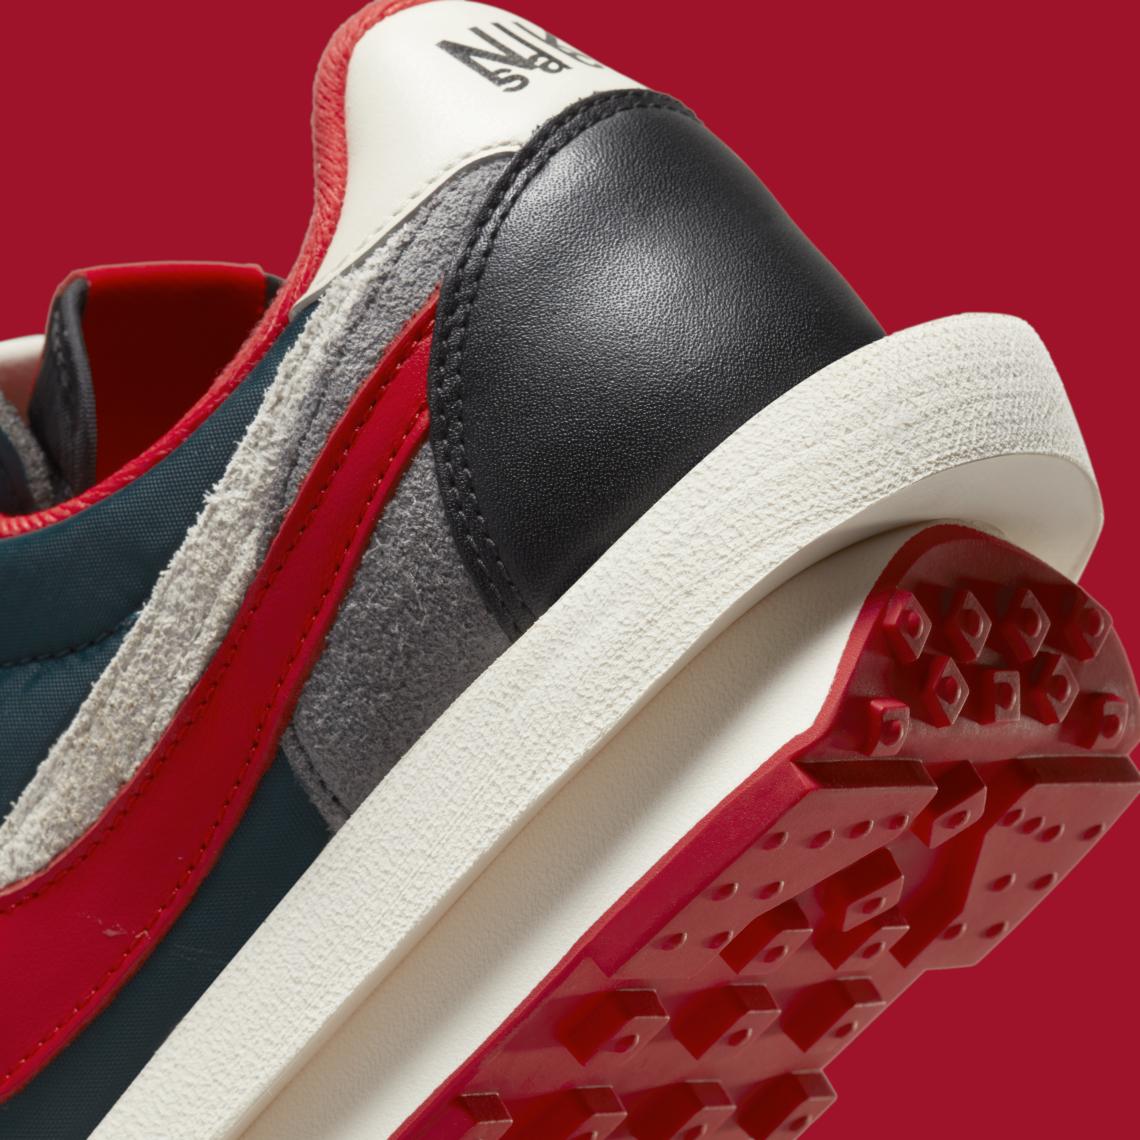 UNDERCOVER x Sacai x Nike LDWaffle ''Midnight Spruce'' - DJ4877-300